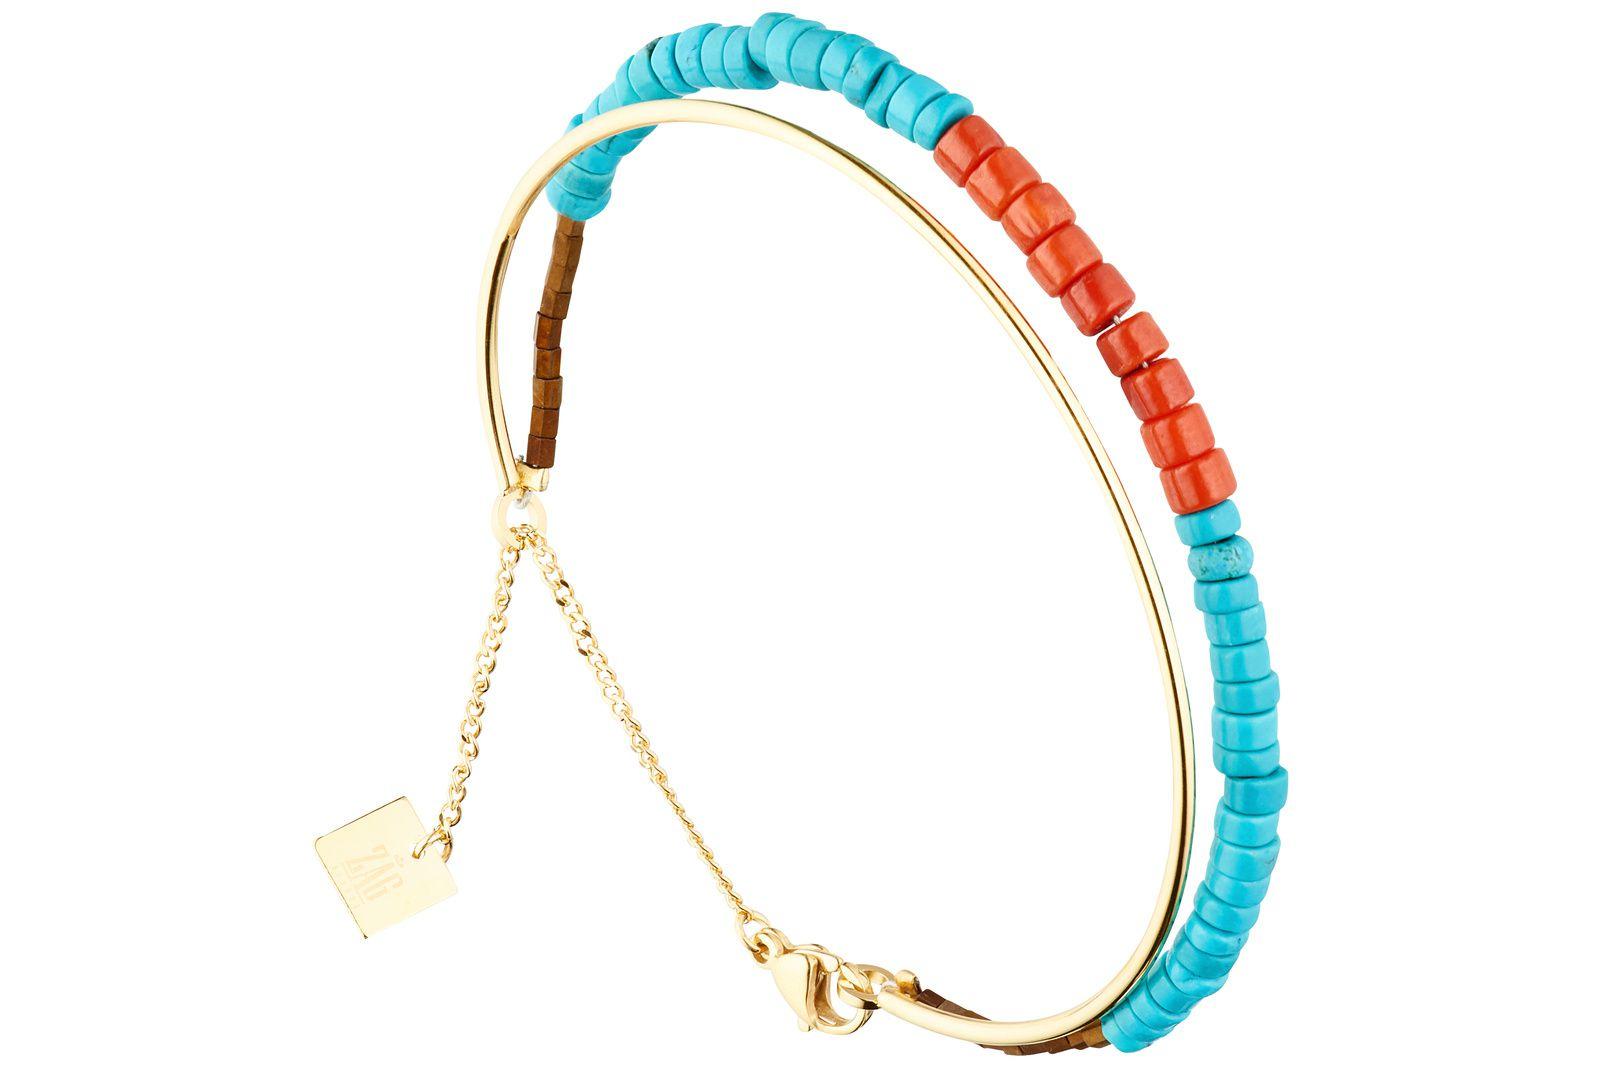 Zag Bijoux, Bracelet jonc, dorure or jaune, bicolore